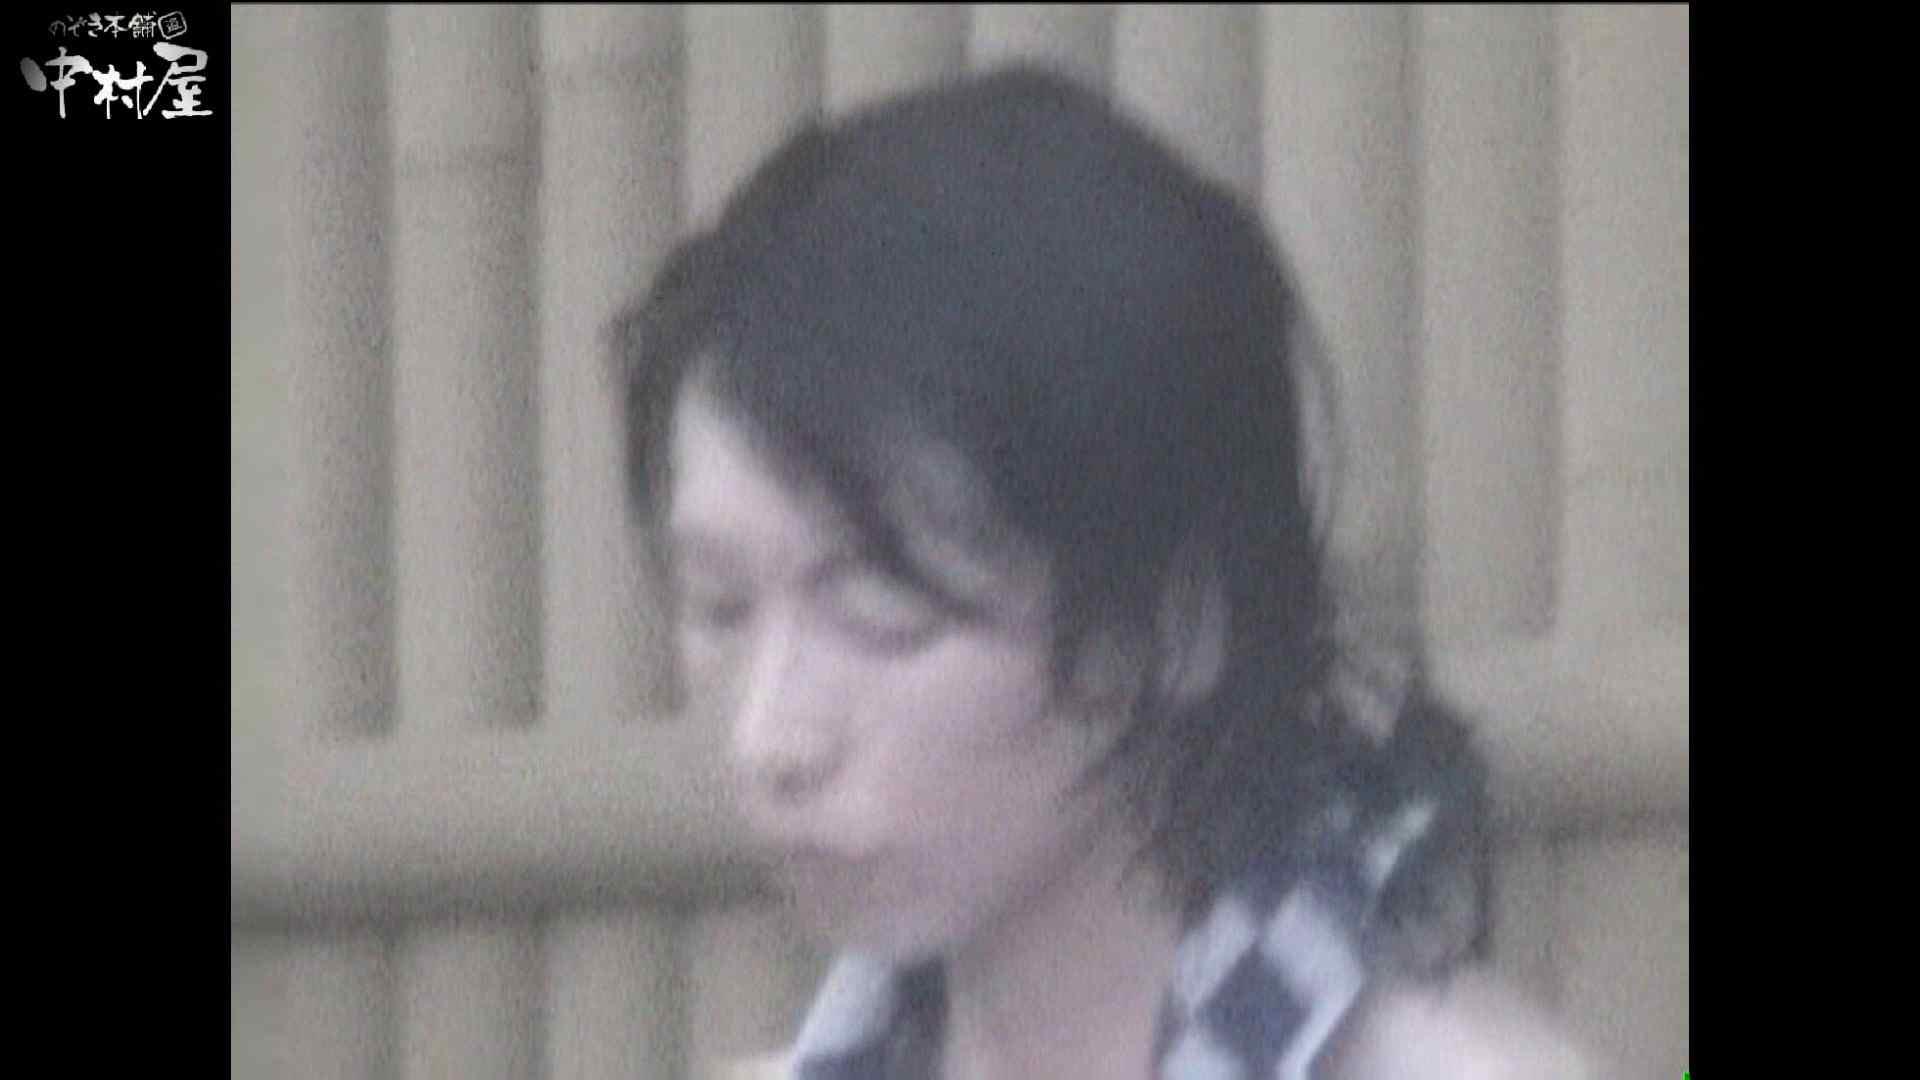 Aquaな露天風呂Vol.987 盗撮 | OLセックス  71画像 49